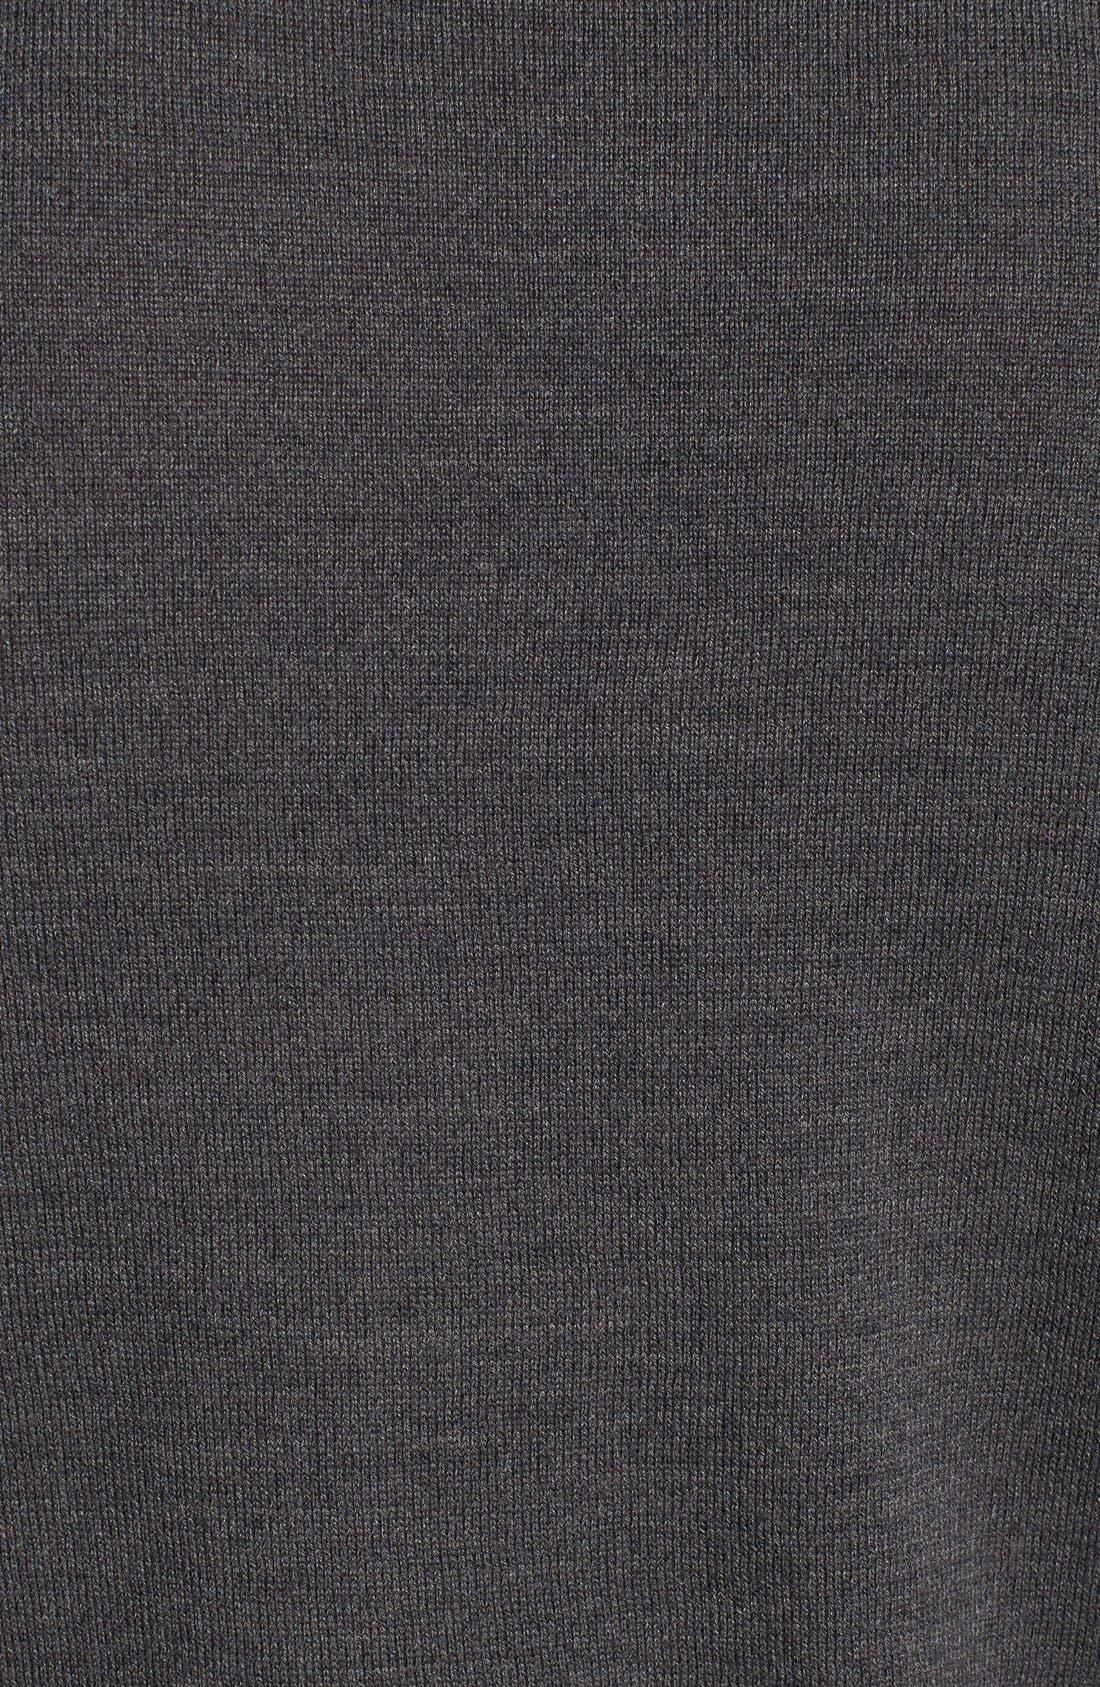 VINCE CAMUTO, Merino Wool Turtleneck, Alternate thumbnail 9, color, CHARCOAL